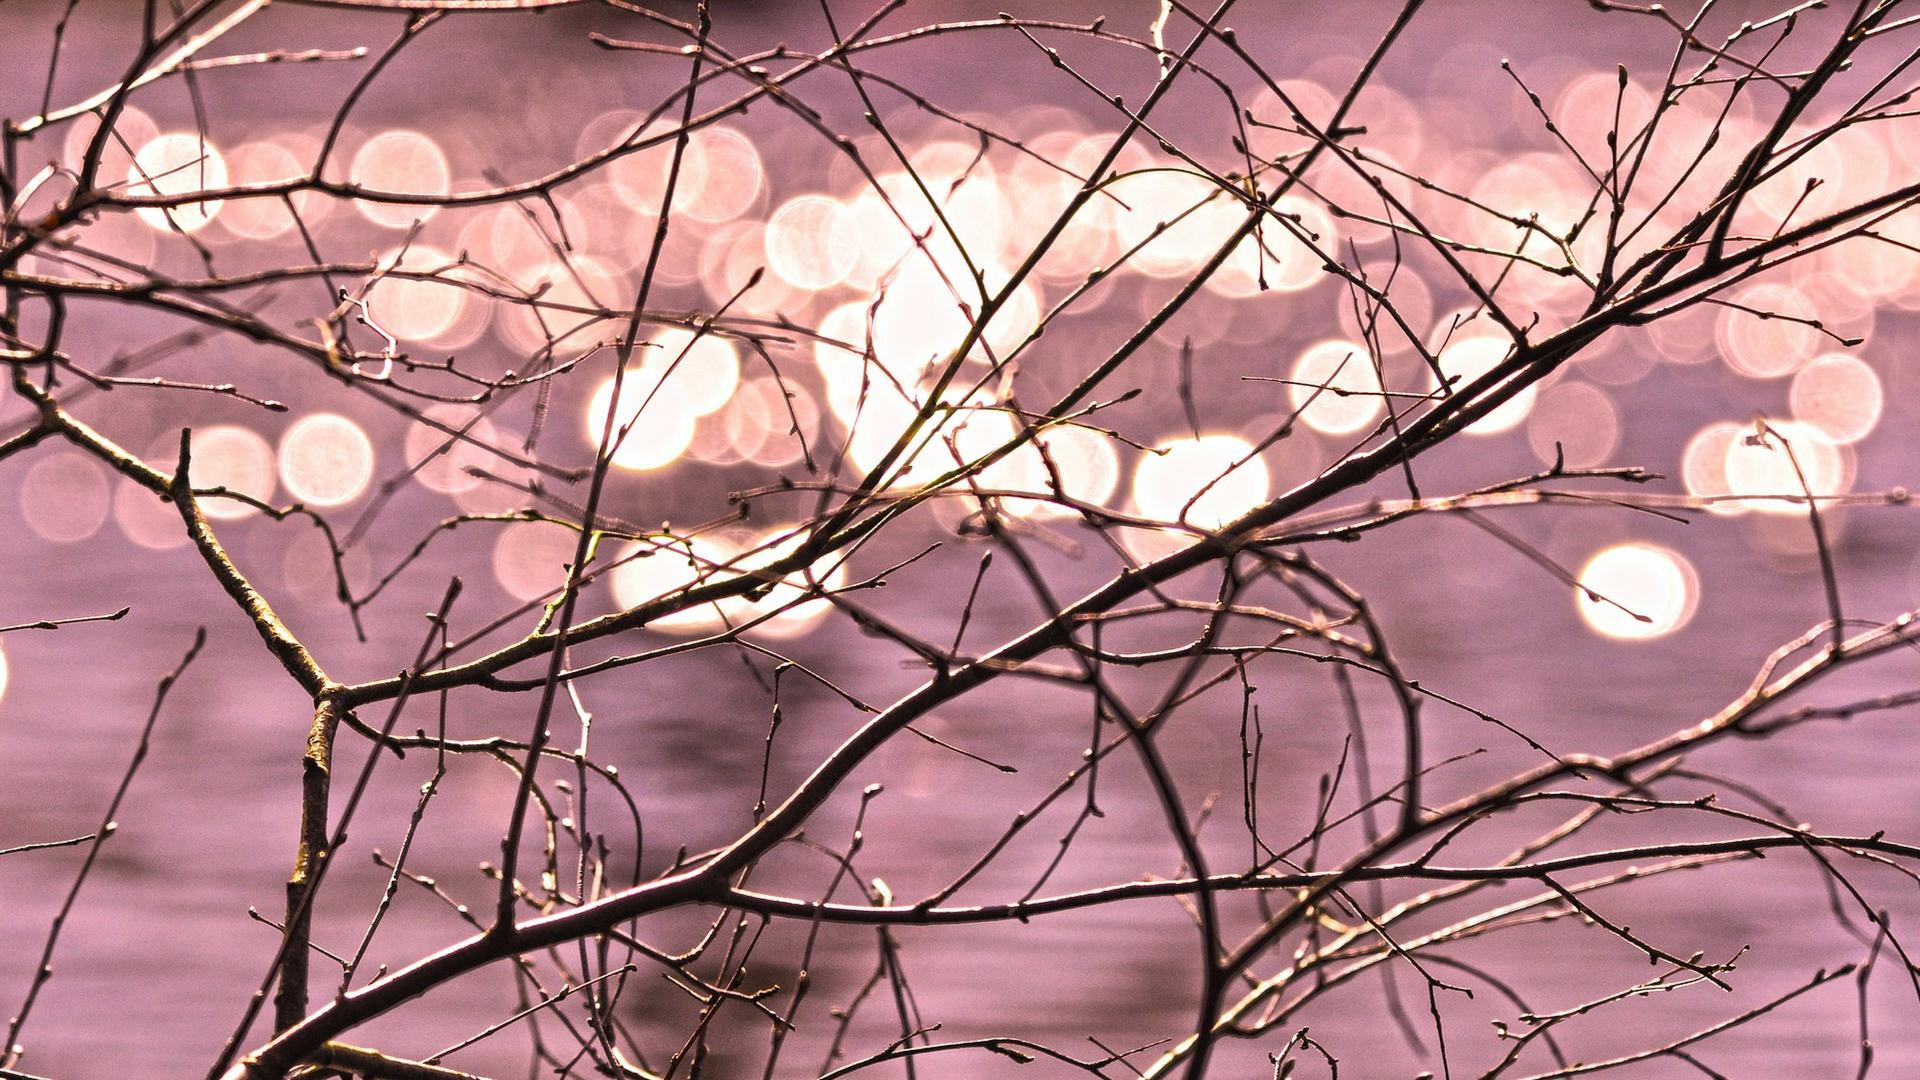 Focus image, branch Photo Credit: Mabel Amber